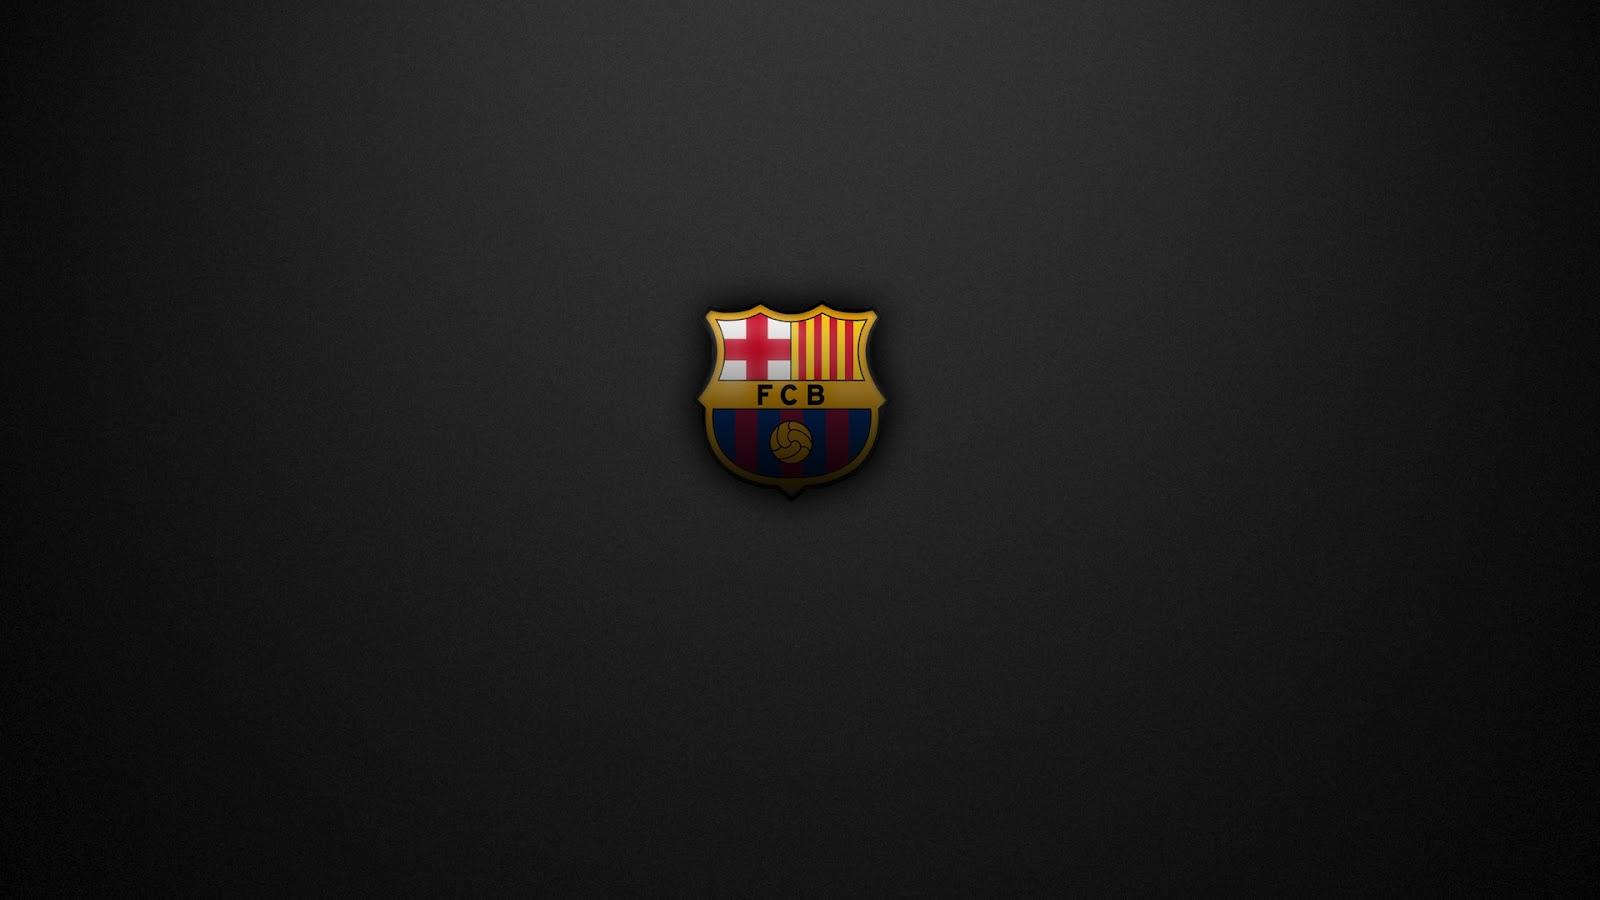 Wallpaper Barcelona Fc 3d Best Barcelona Fc Desktop Wallpapers Hd Wallpapers